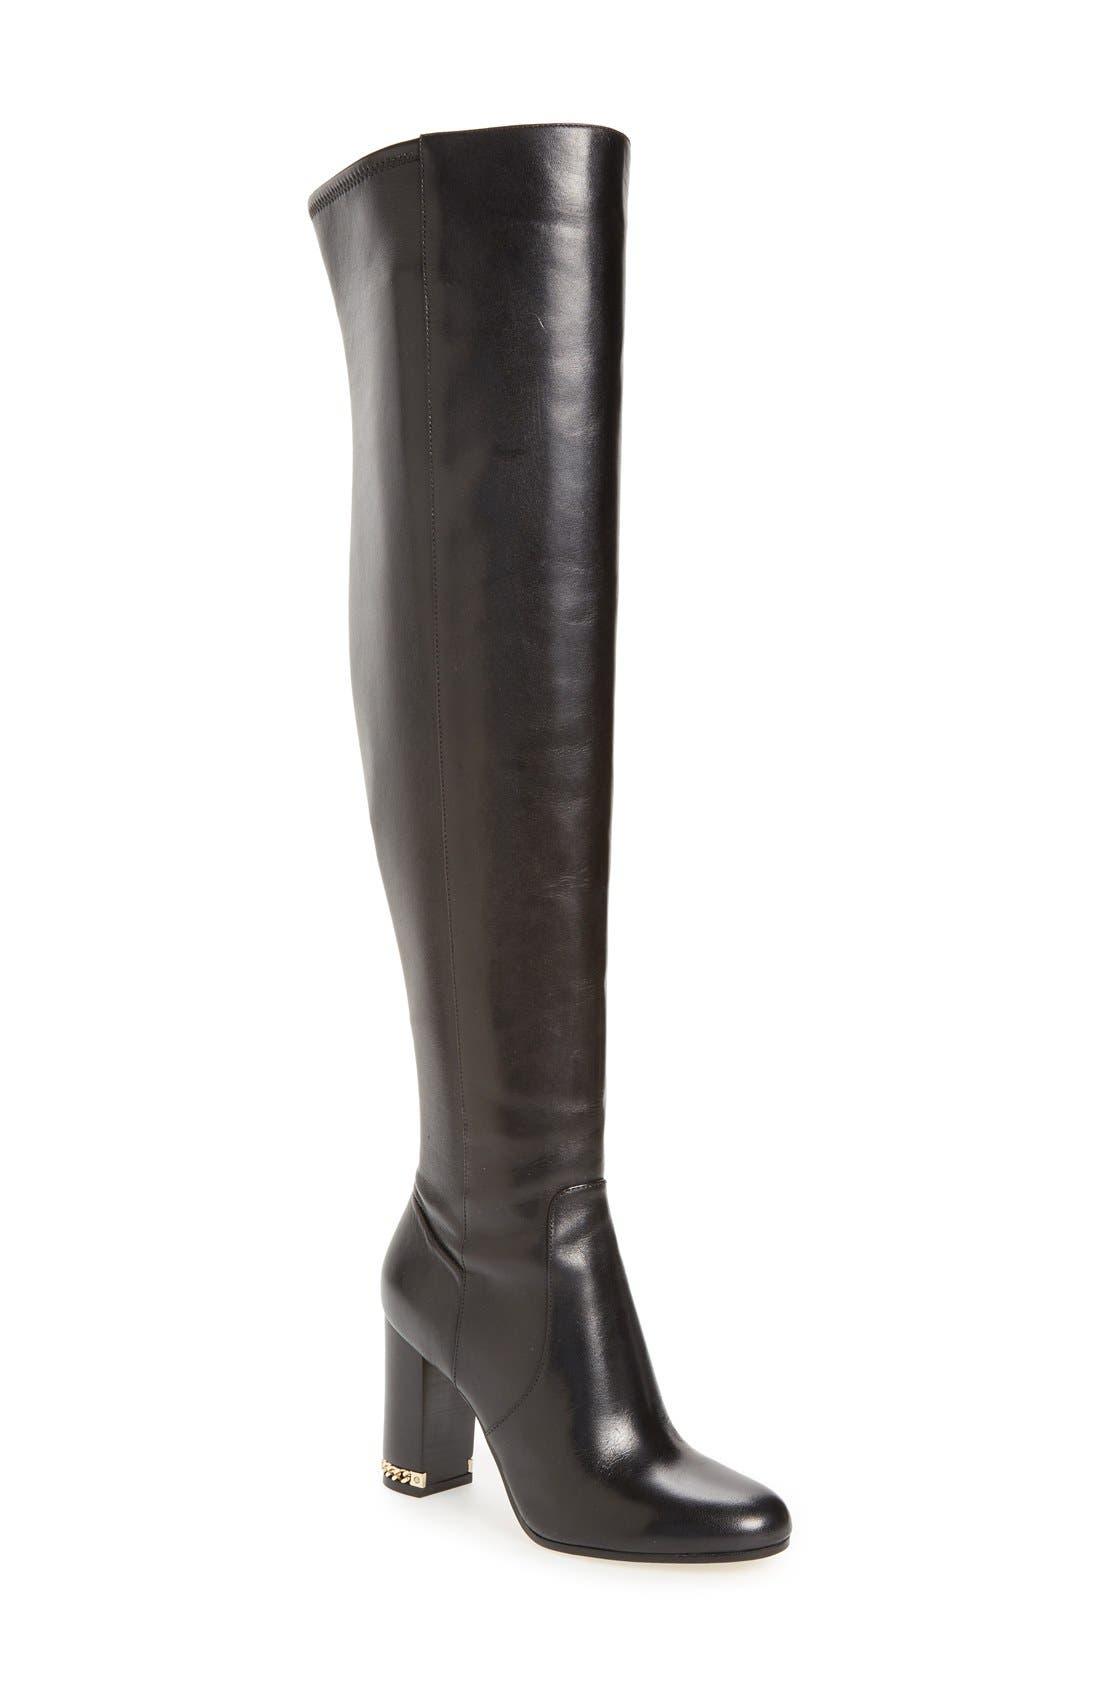 Main Image - MICHAEL Michael Kors Sabrina Over the Knee Boot (Women)